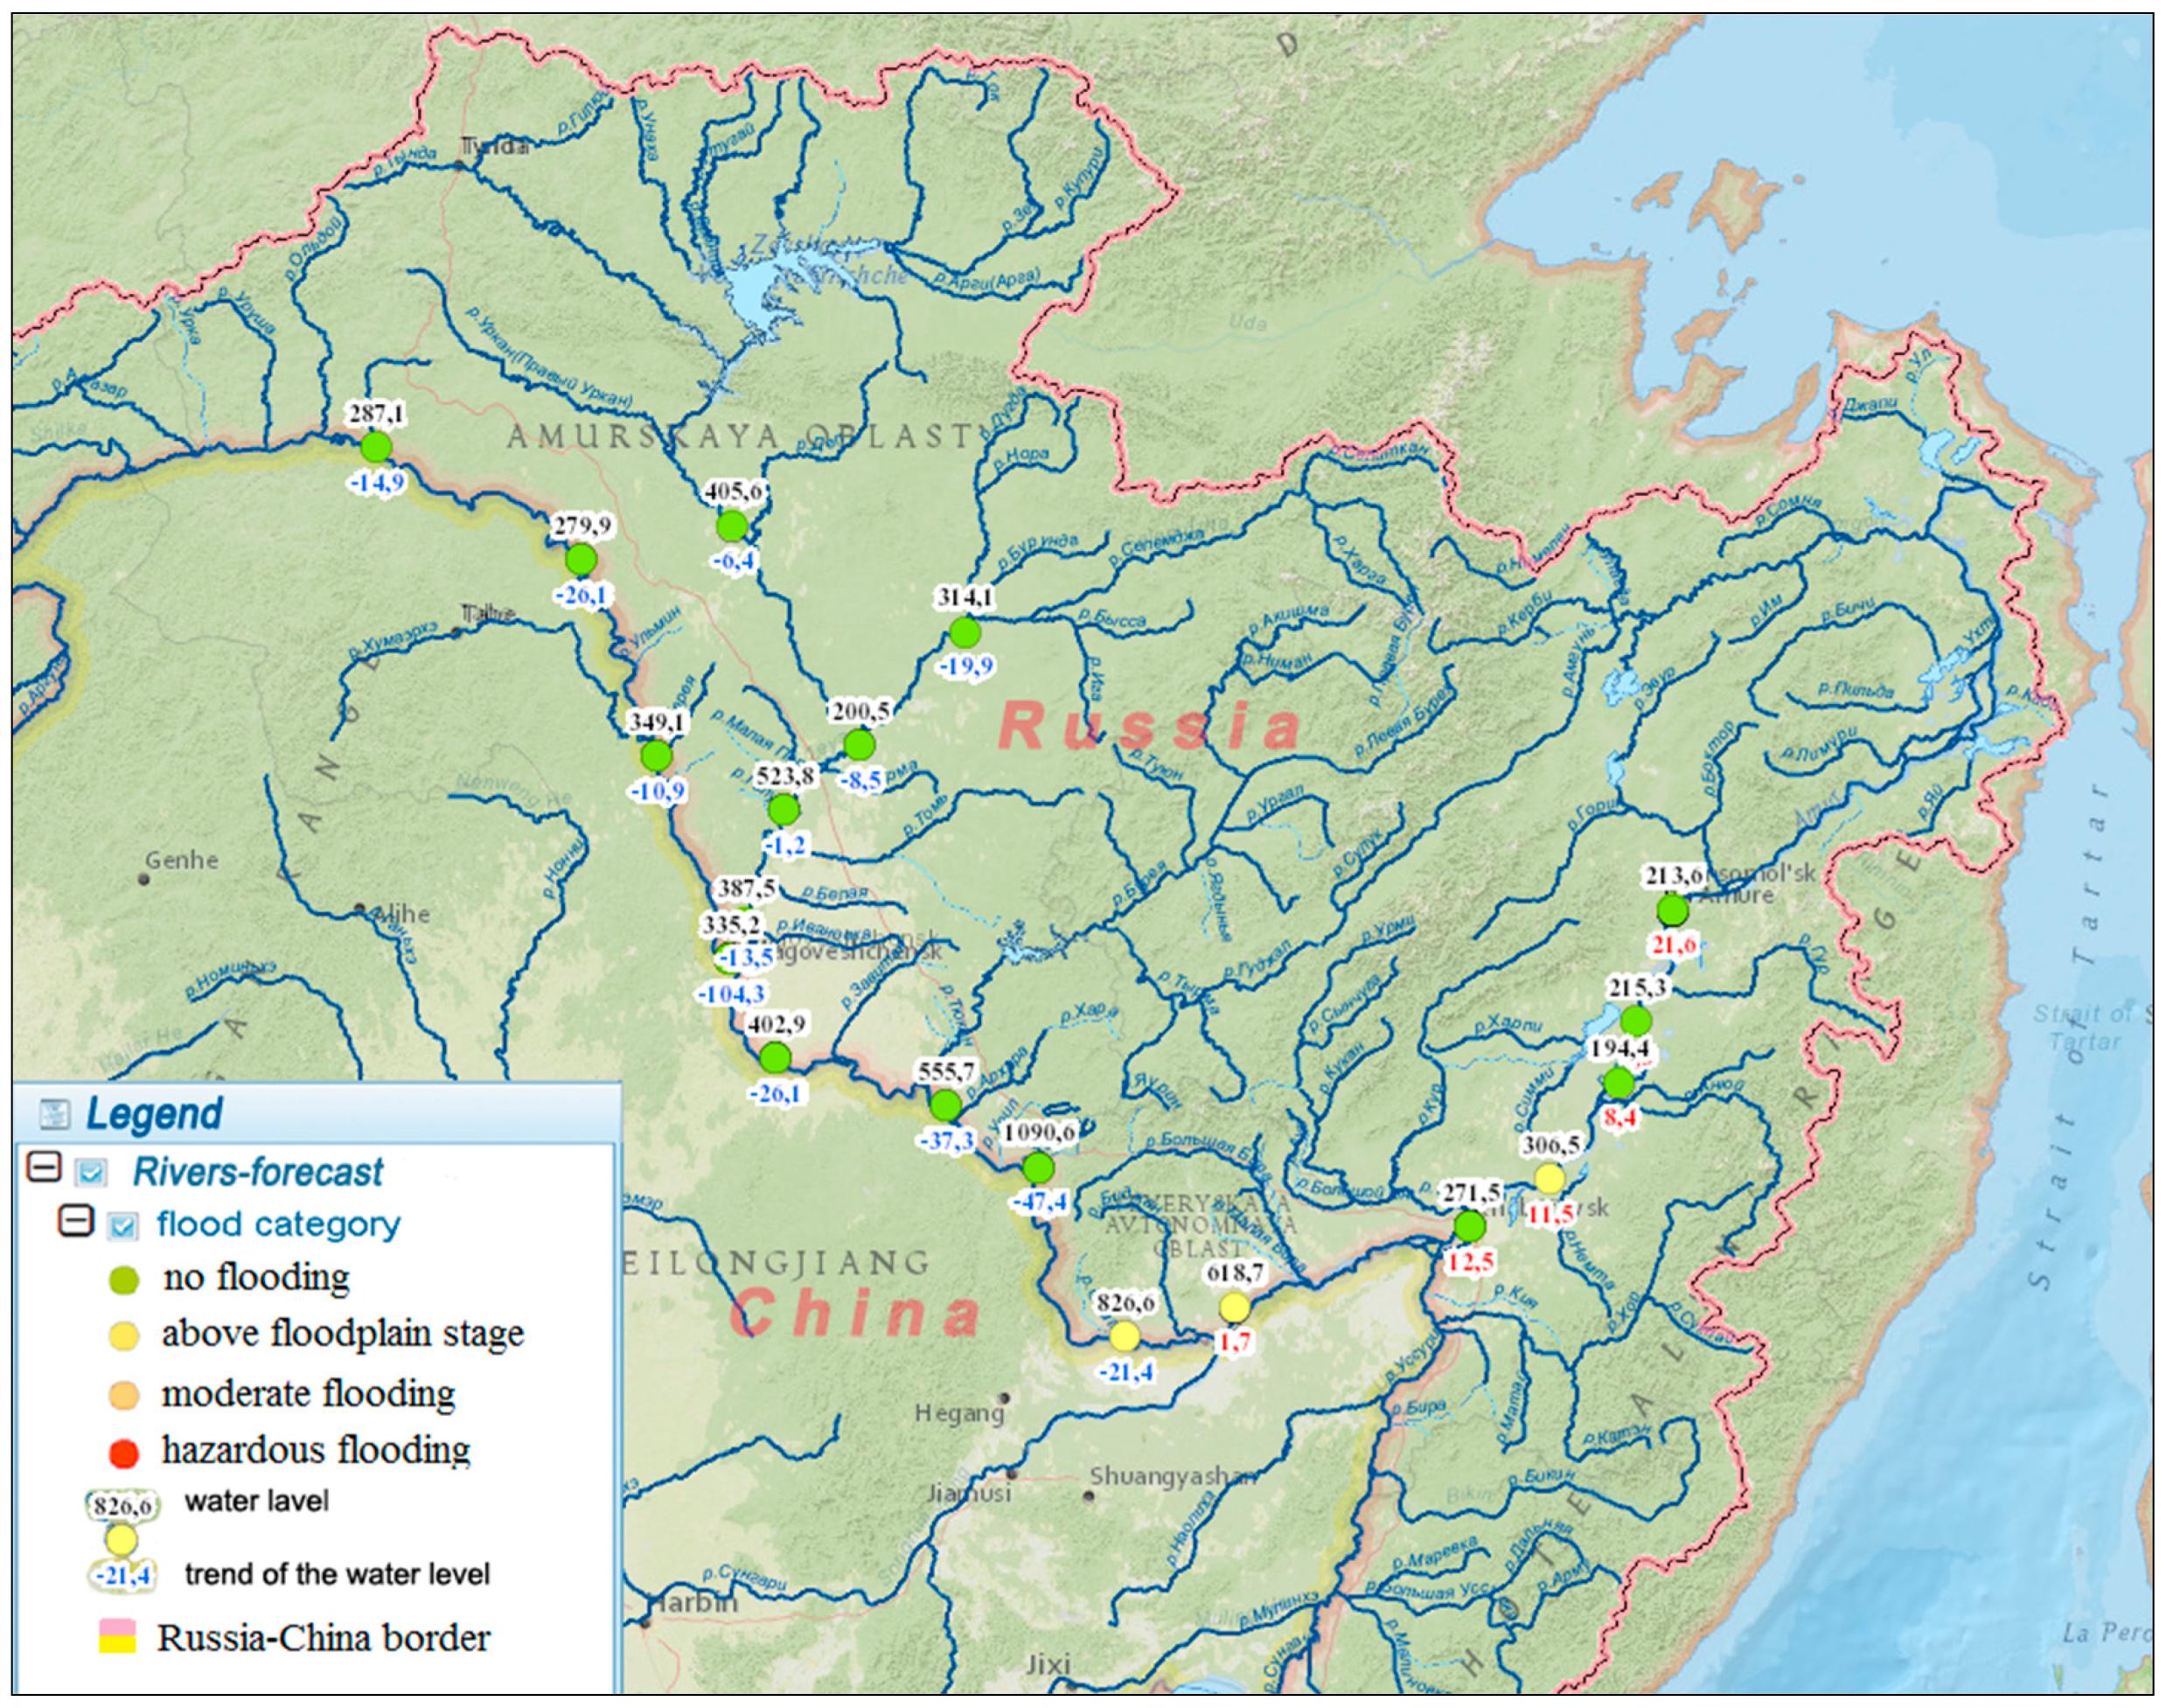 Geosciences | Free Full-Text | A Basin Approach to a ... on gobi desert map, brahmaputra river map, caspian sea map, indus river, ganges river map, euphrates river map, kamchatka peninsula map, lake baikal, lena river, kuril islands, ganges river, amu darya, yellow river, moscow map, ob river, irrawaddy river map, mackenzie river, danube map, yalu river, yangtze river, mekong map, yenisei river map, aral sea map, yangtze river map, himalayas map, bering sea map, yenisei river, don river map, xi jiang river map, chang jiang river map, russia map, amu darya river map, ural river, kamchatka peninsula, brahmaputra river,